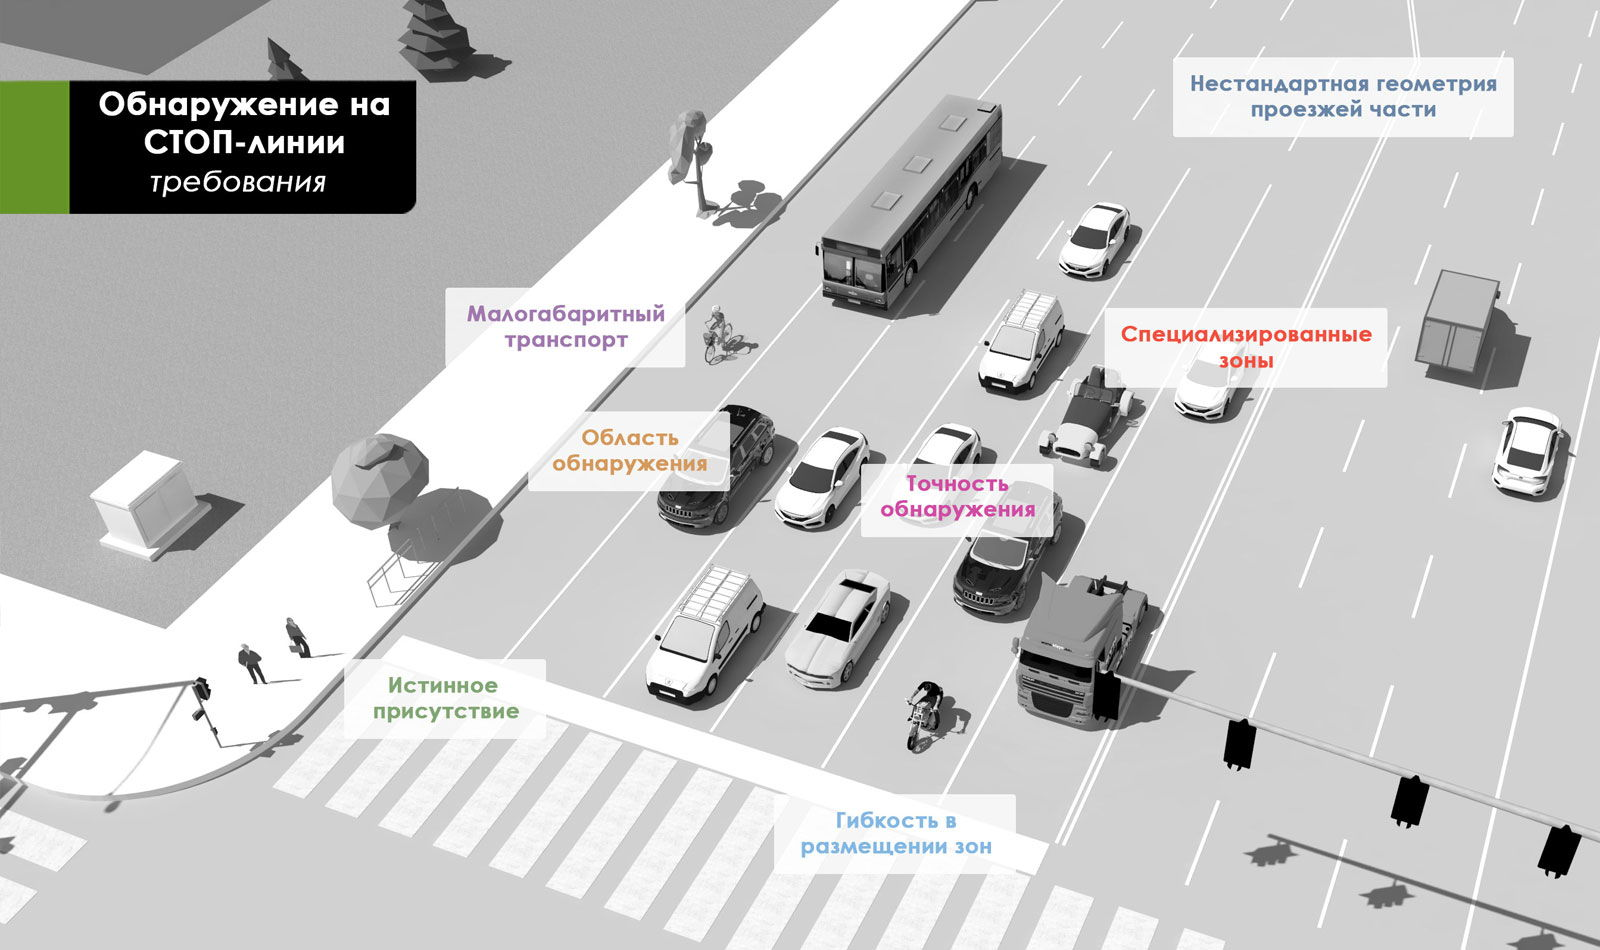 Обнаружение-транспорта-на-СТОП-линии